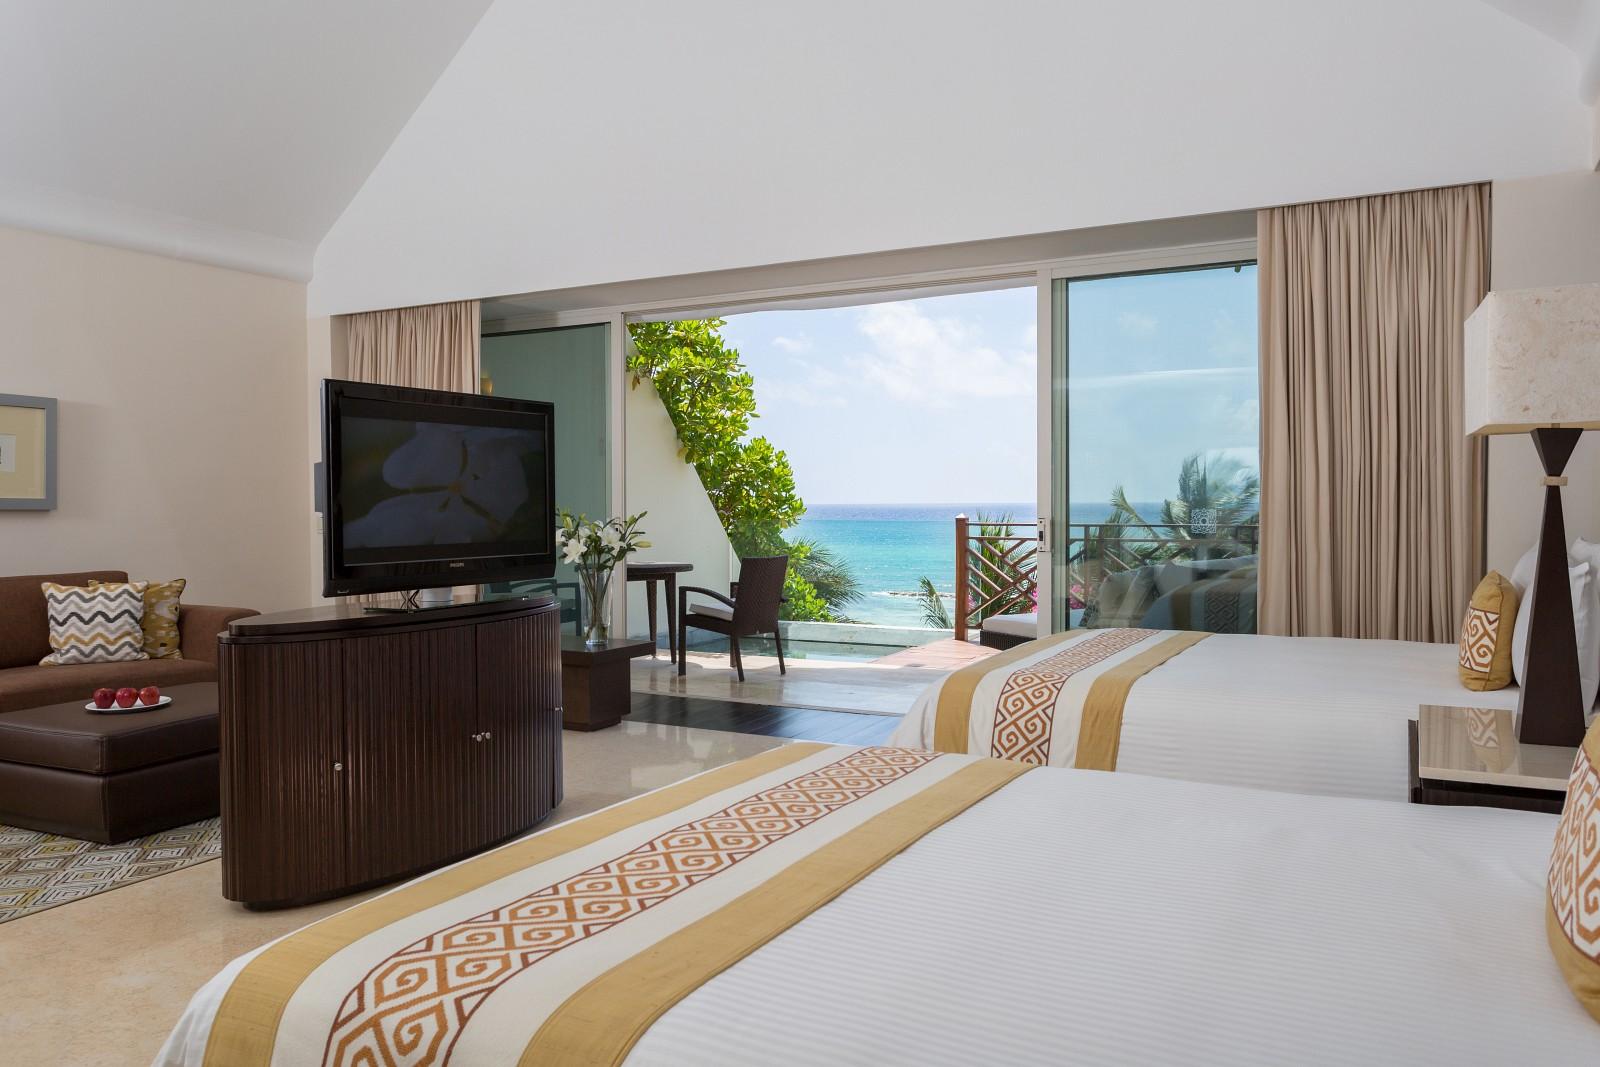 Travel Agency All-Inclusive Resort Grand Velas Riviera Maya 043